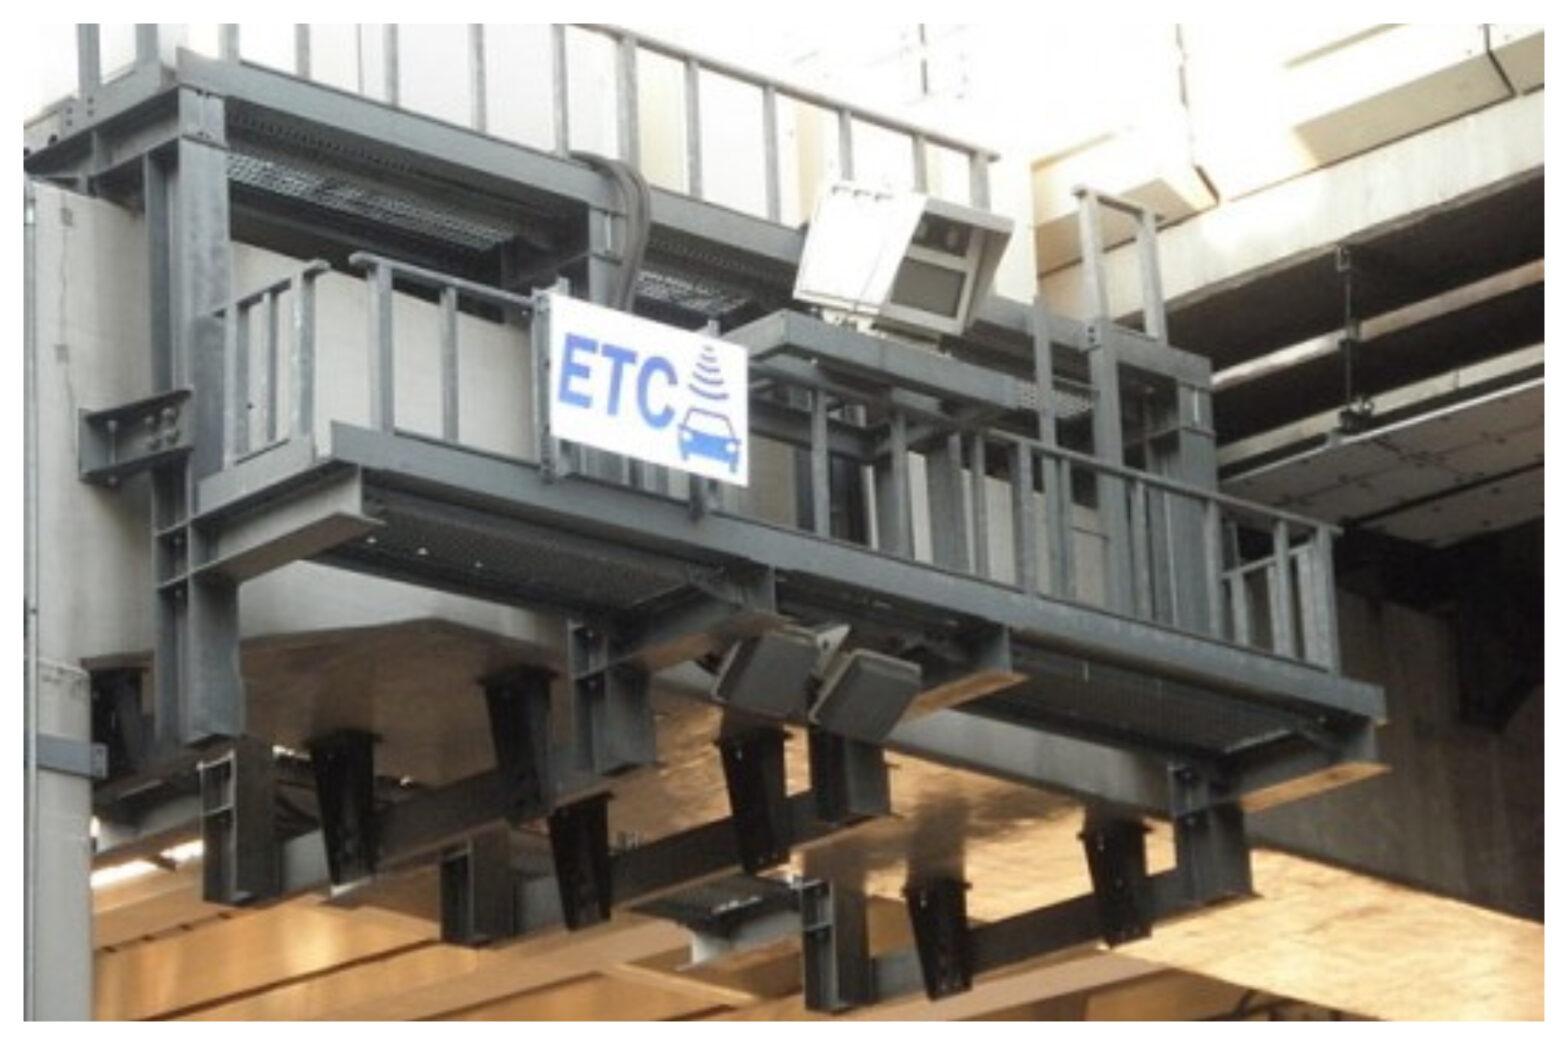 ETC2.0とは?メリットやデメリットから利用方法・割引・ドライブスルーでの利用まで徹底解説